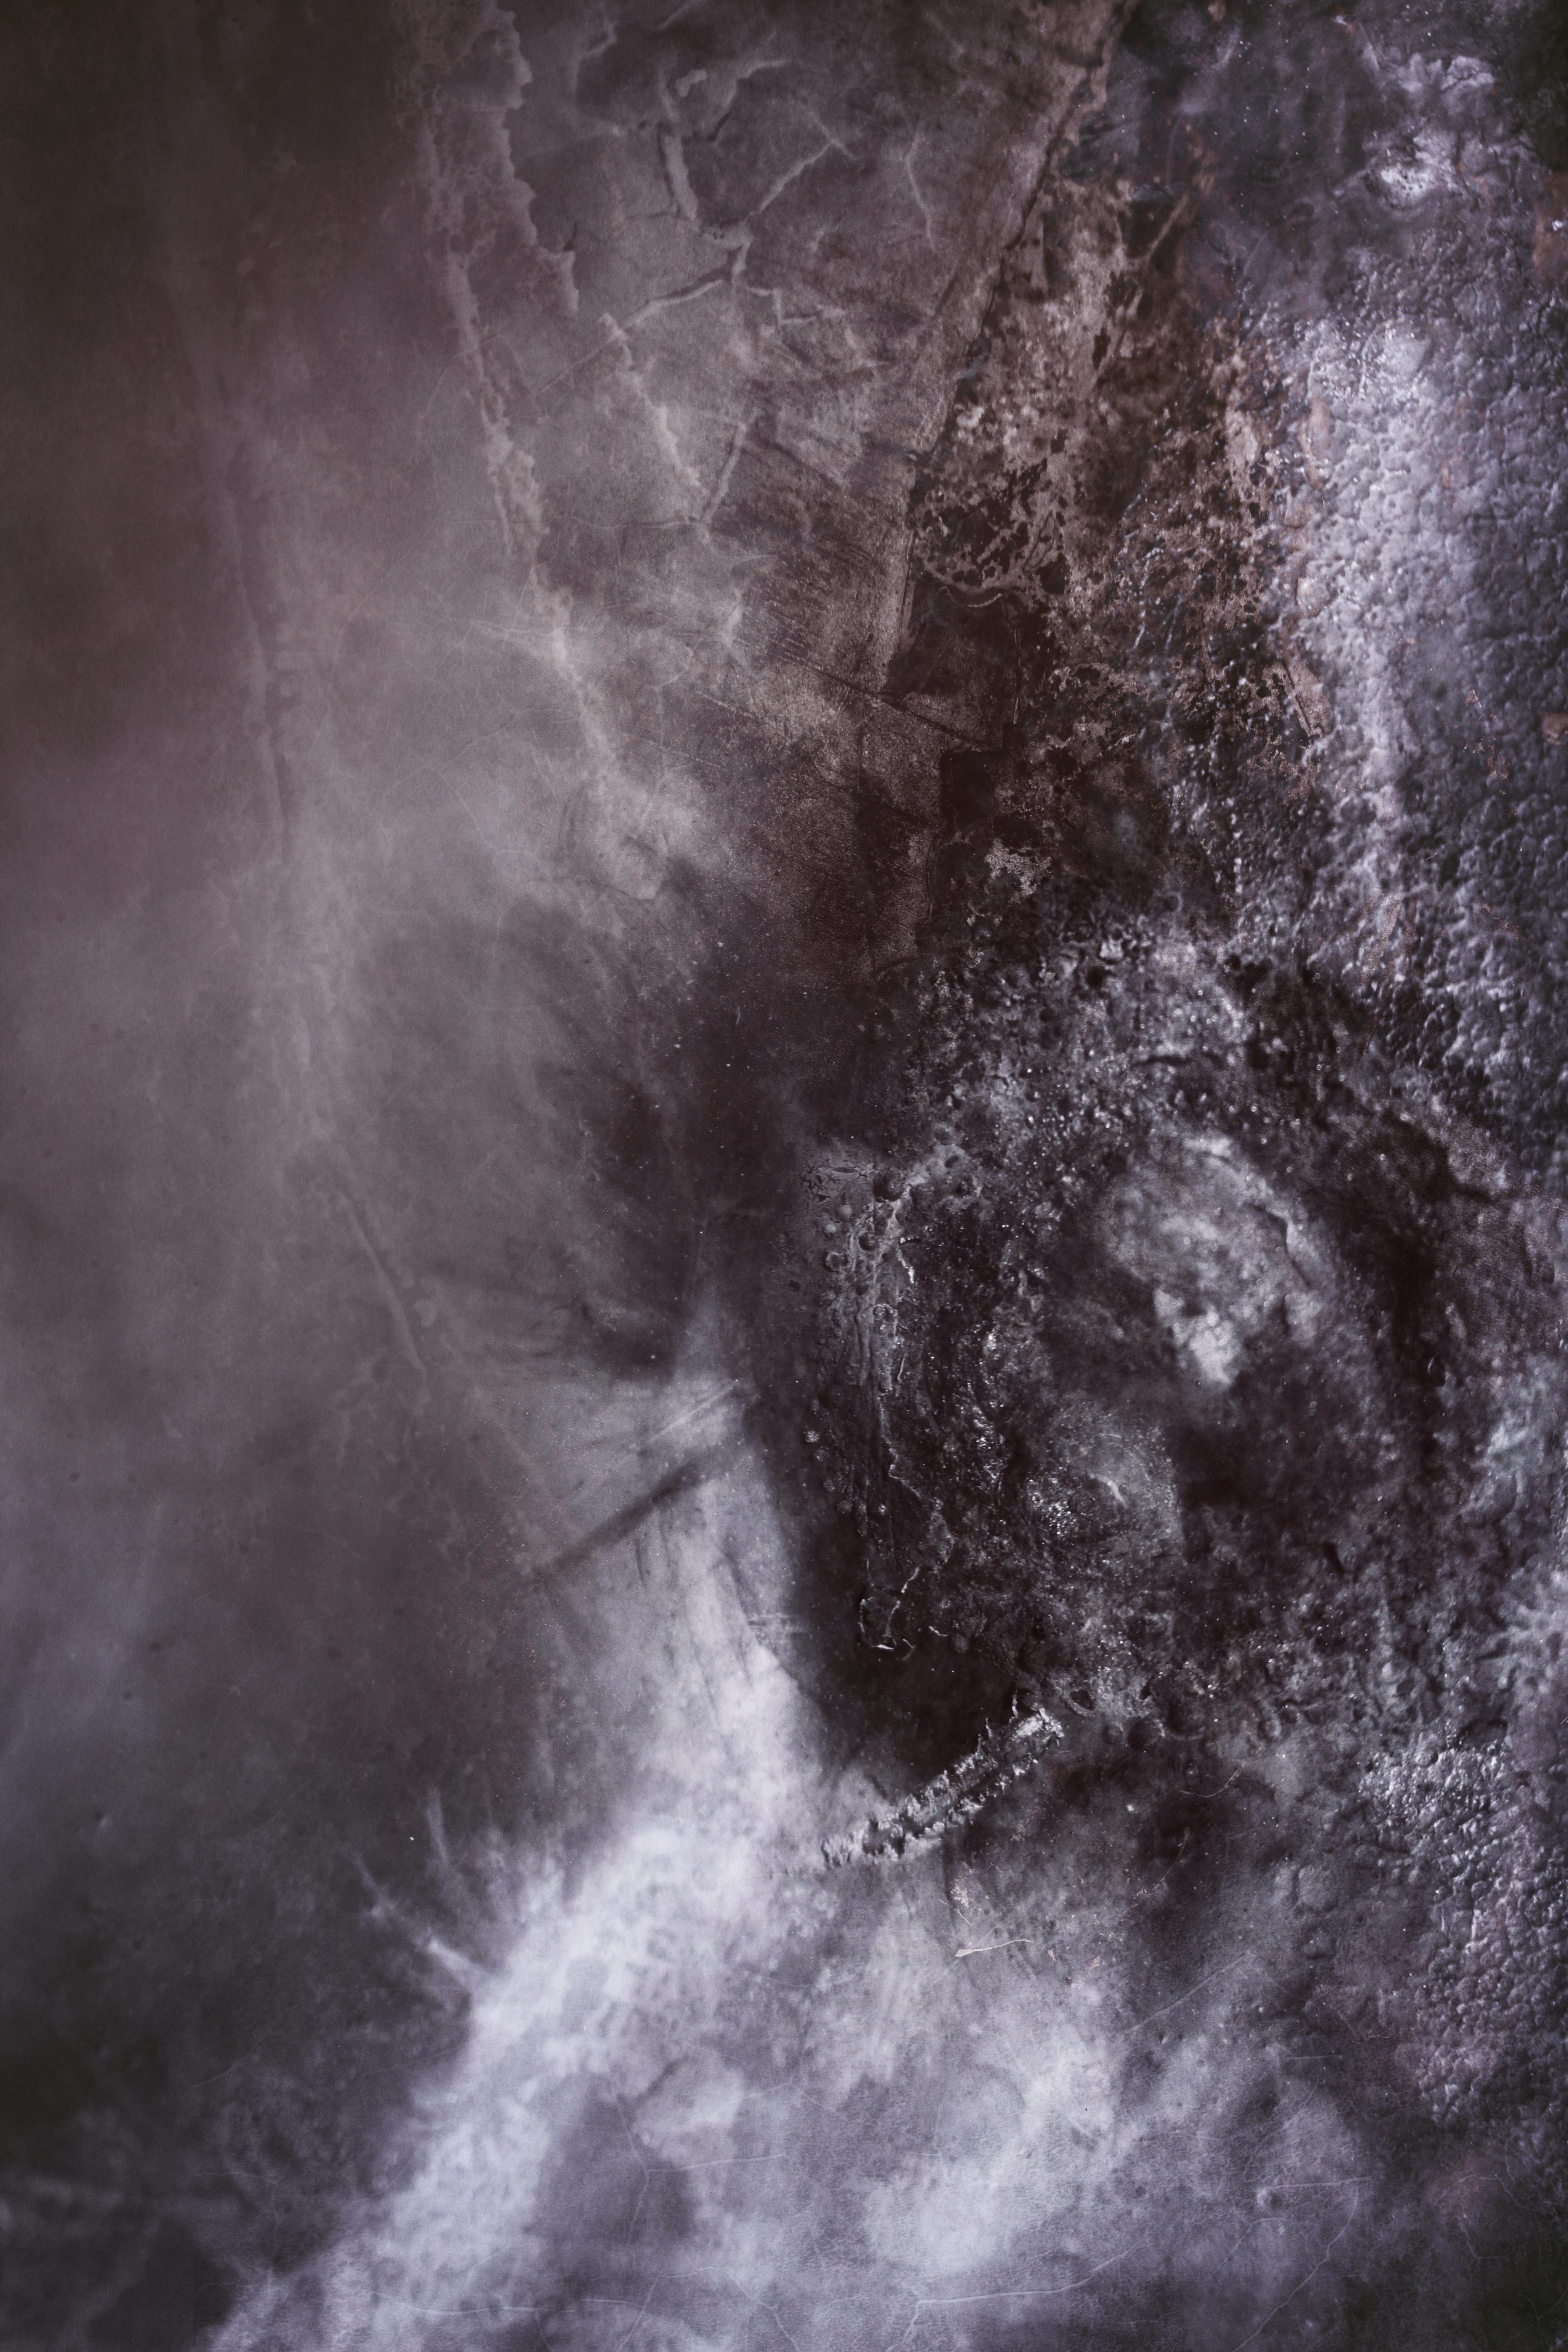 Digital Art Texture 191 by mercurycode